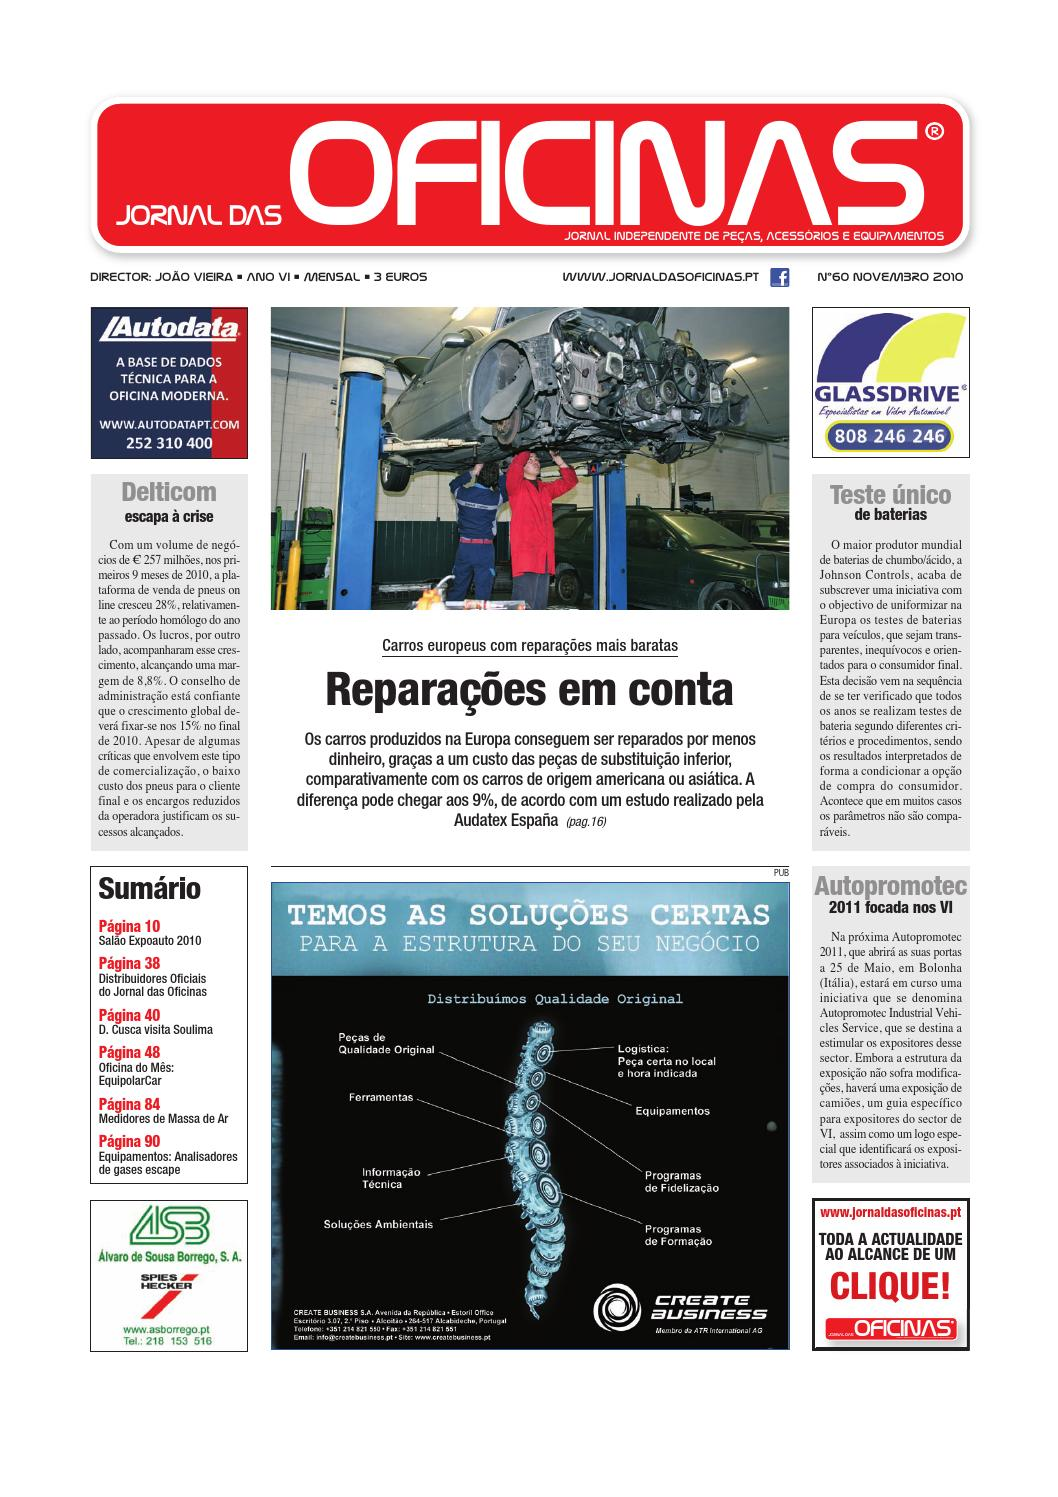 Jo060lr by Jornal das Oficinas - issuu